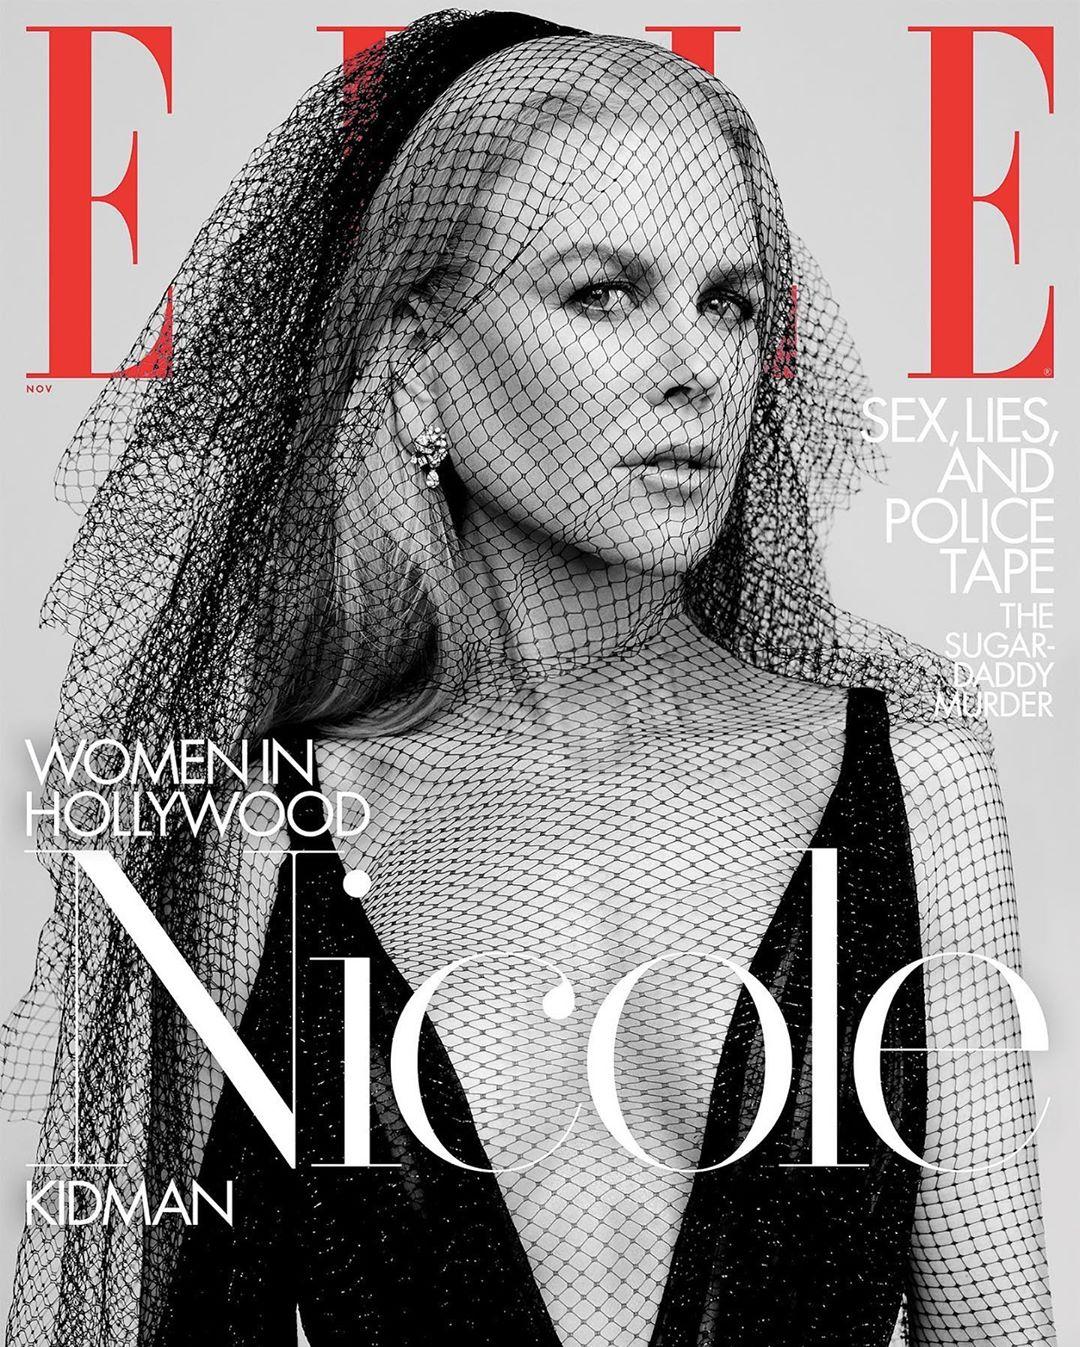 Николь Кидман одна из лауреатов премии Woman in Hollywood 2019.